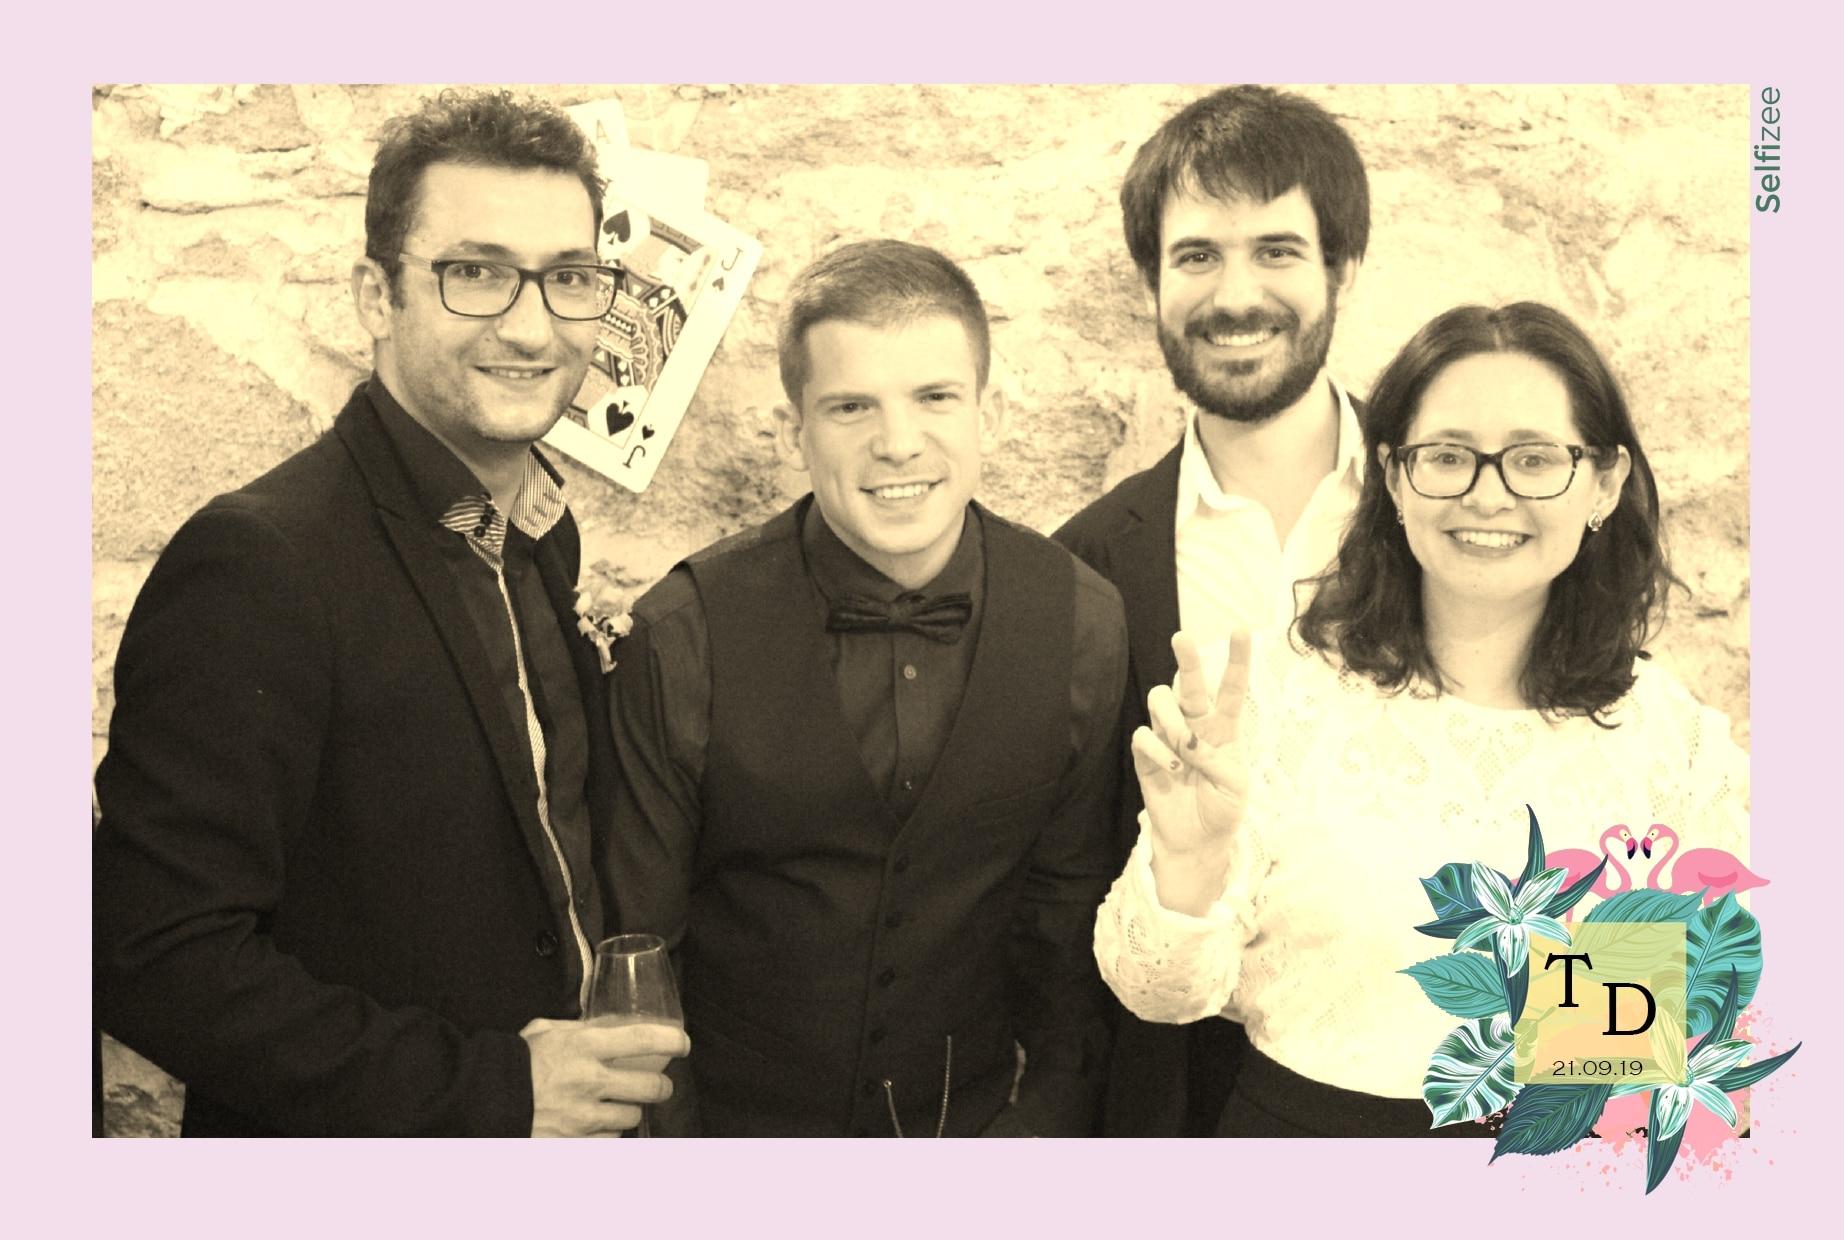 Animation selfie mariage Avignon - location photobooth mariage Avignon et Vaucluse avec impressions photos